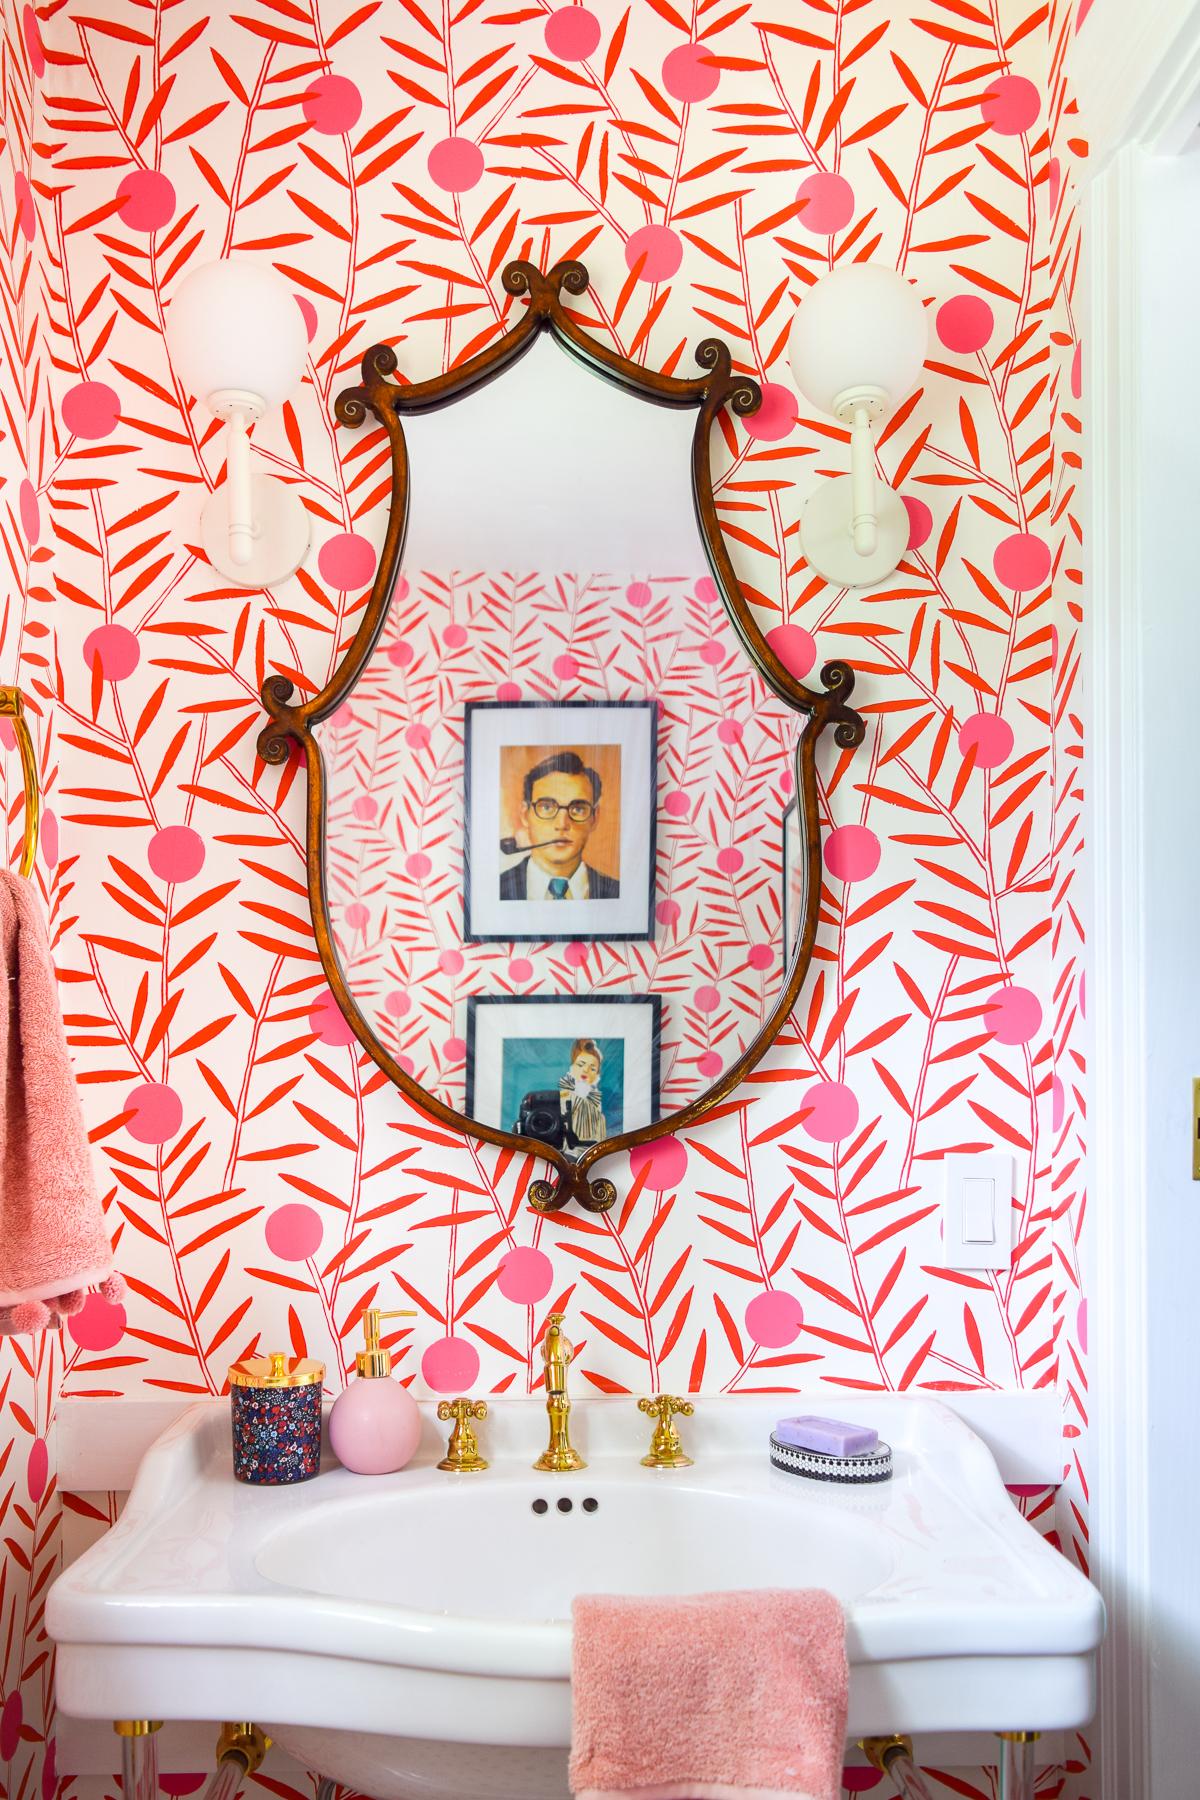 Colorful Pink Wallpaper | Colorful Powder Room | Wallpapered Bathroom | Small Bathroom Wallpaper | Half Bath Wallpaper